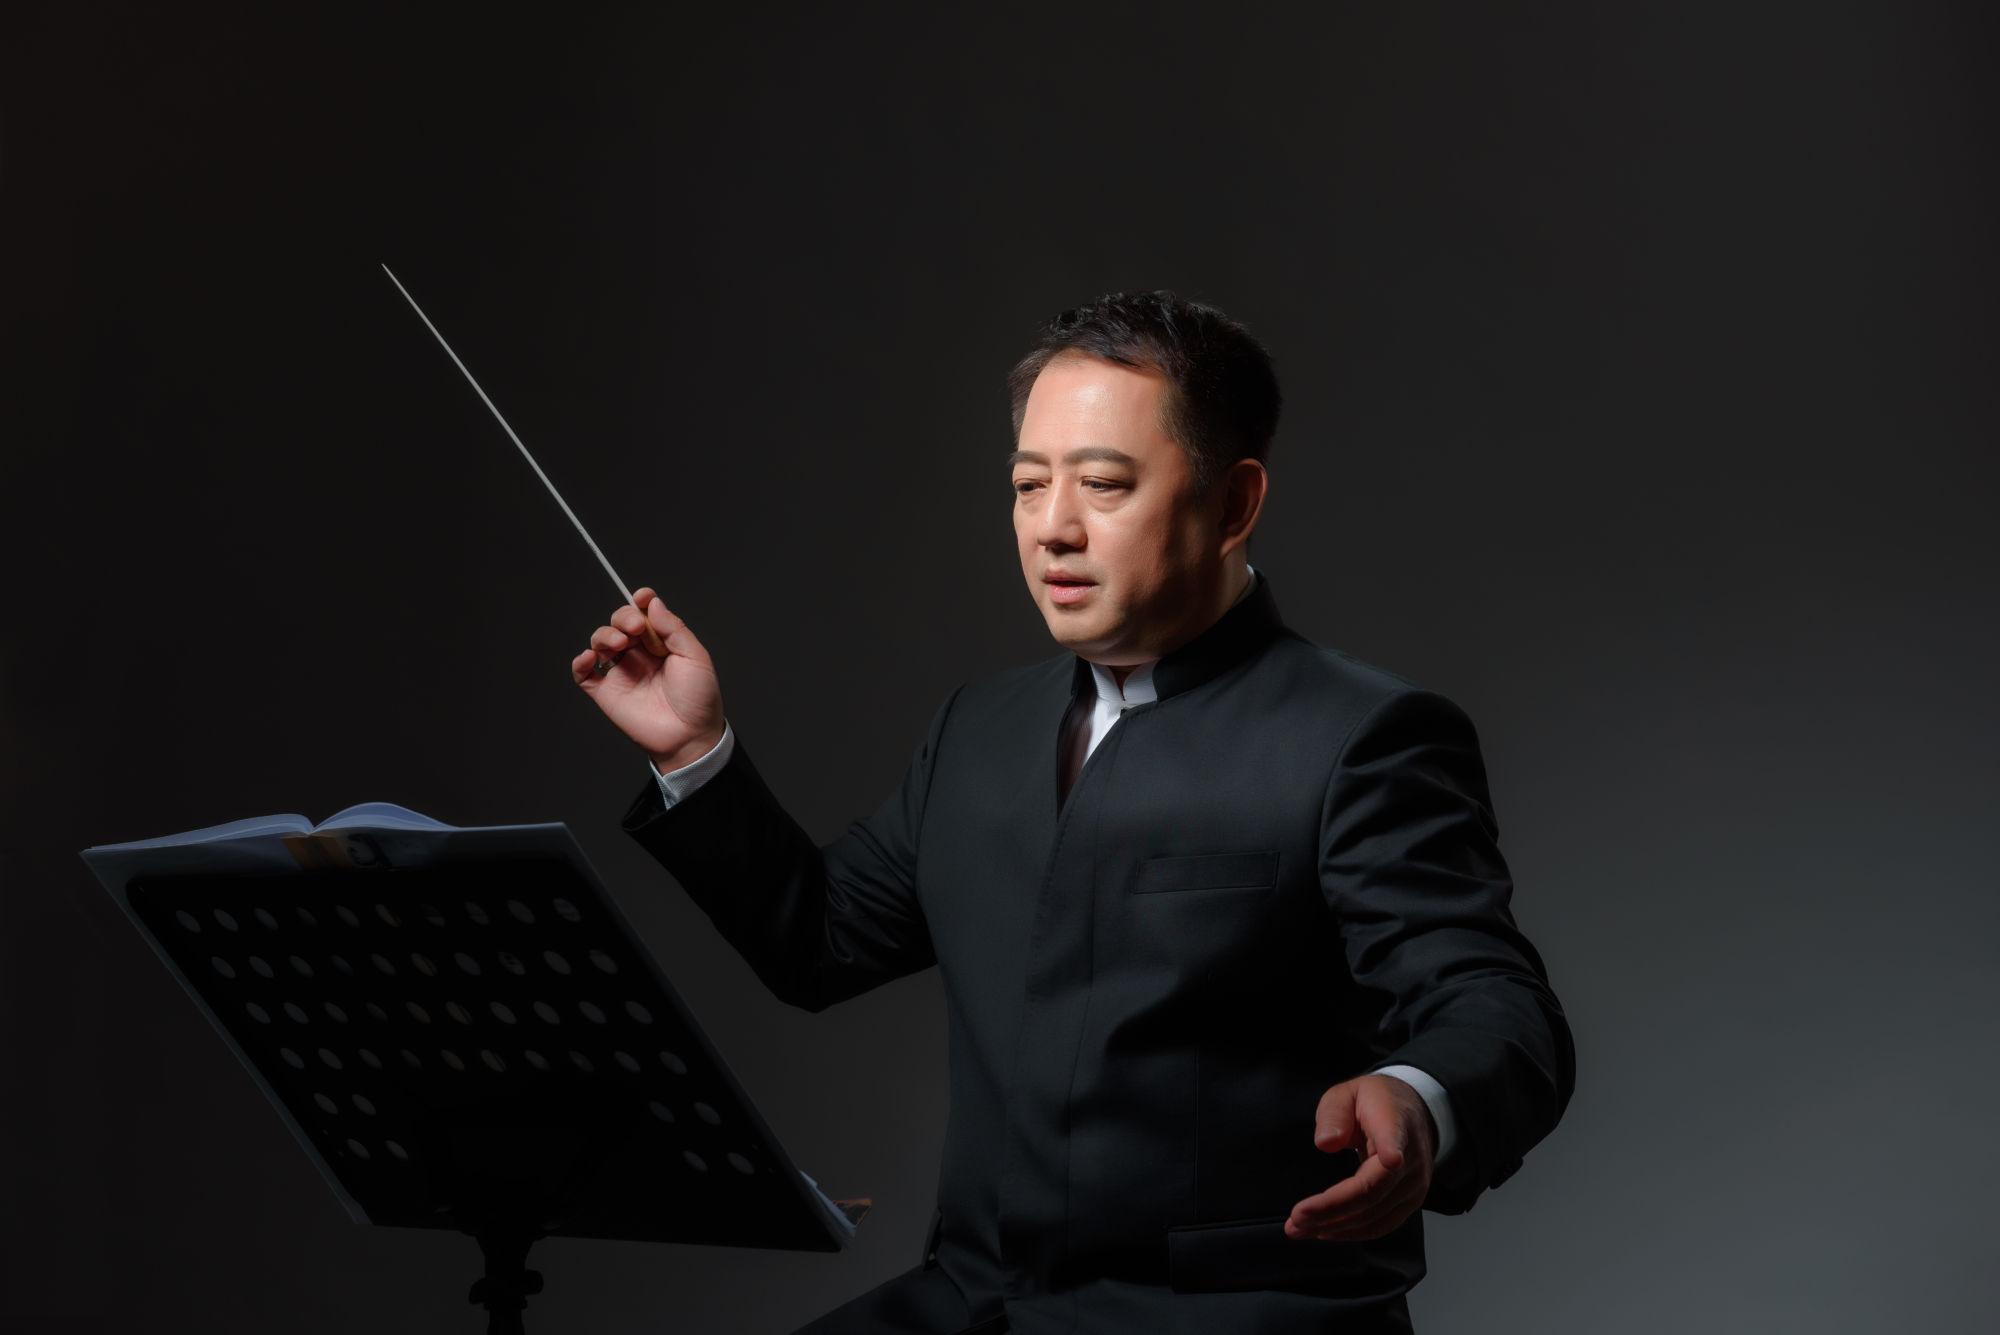 macao orchestra art macao macau lifestyle lu jia